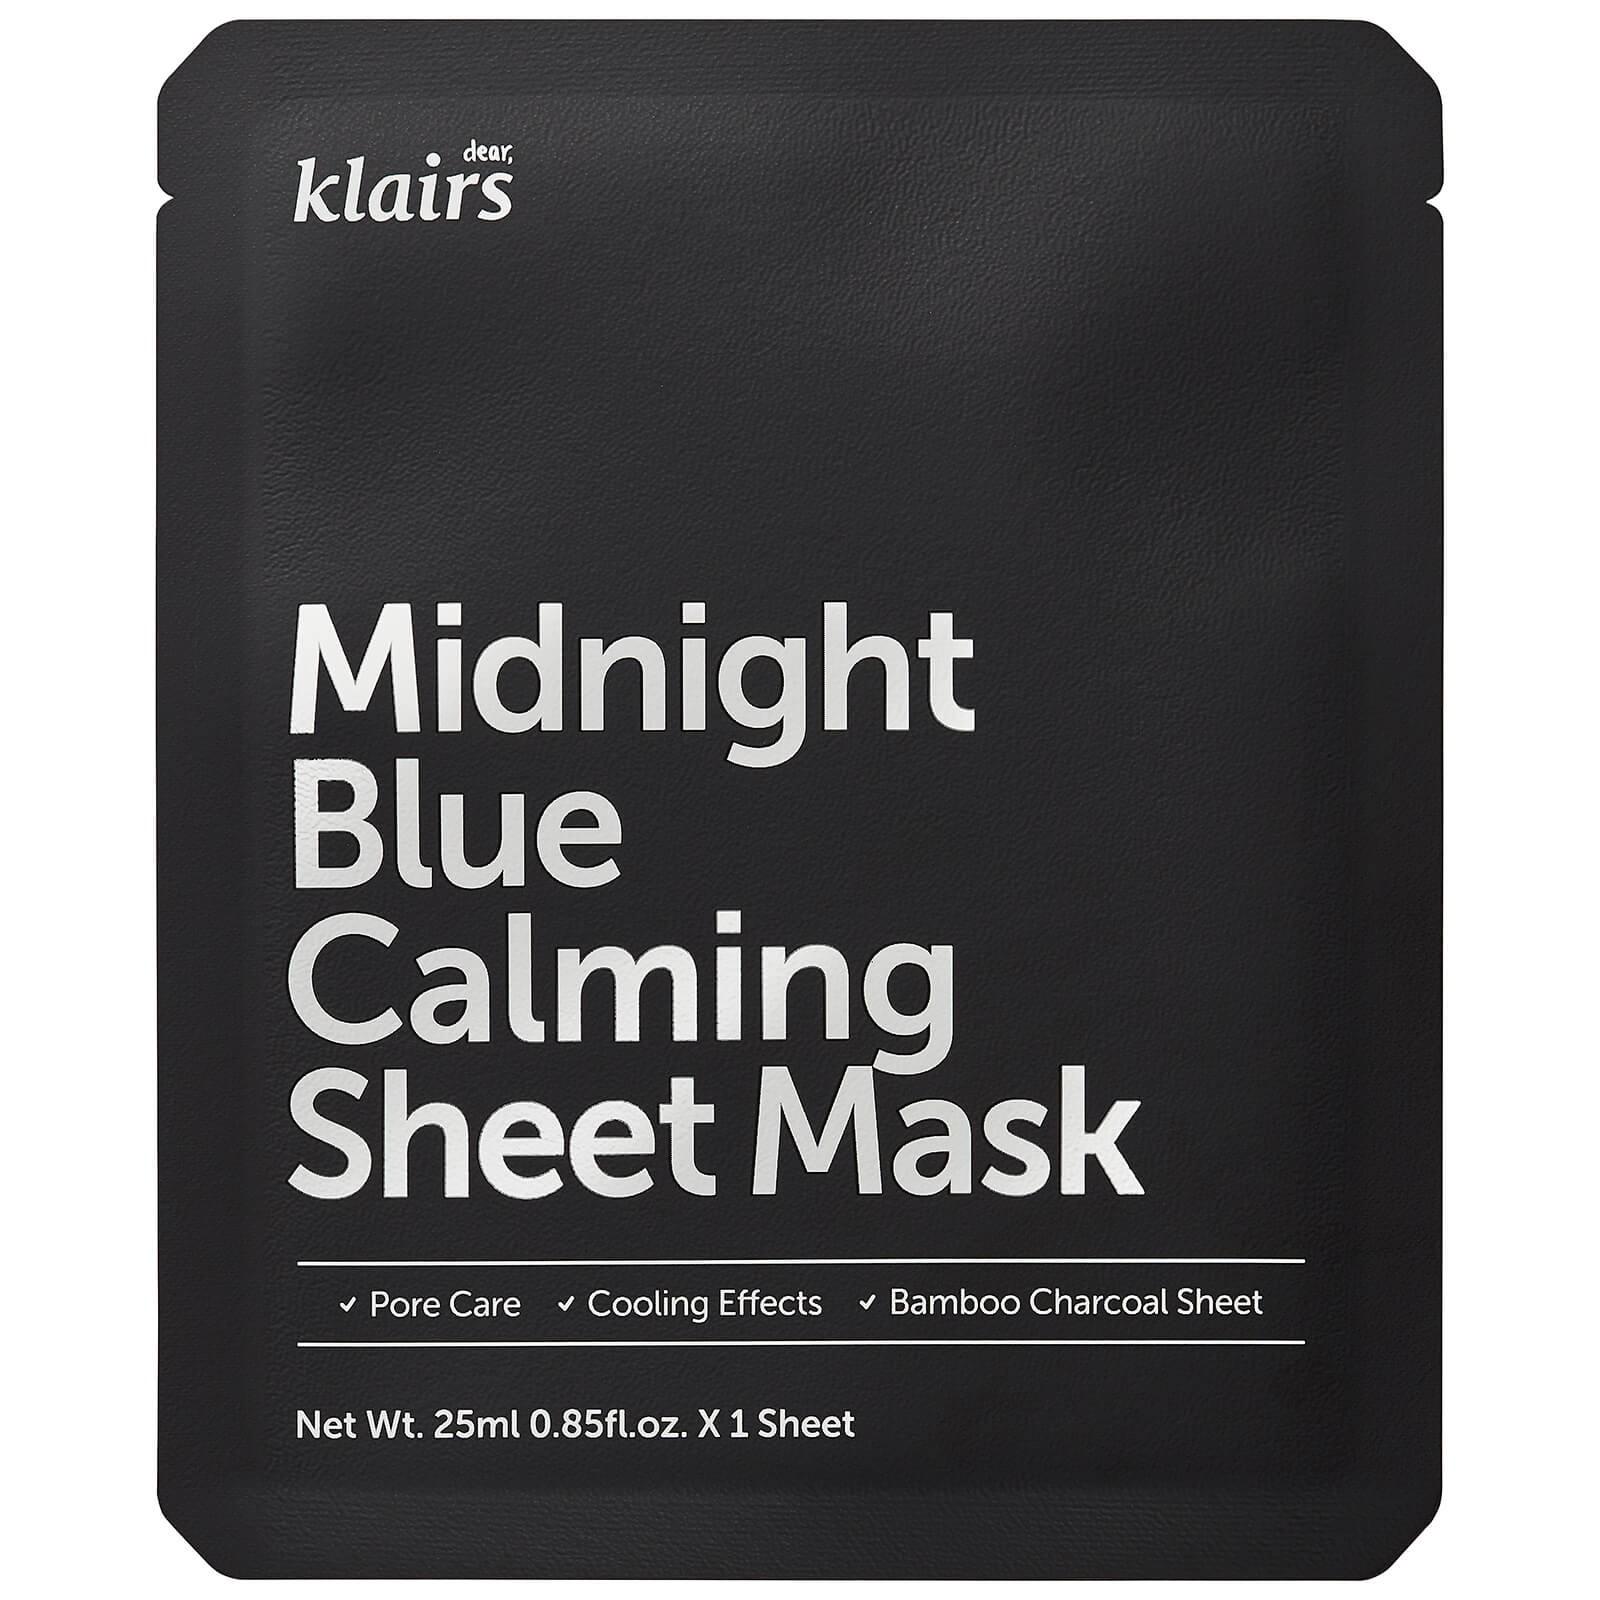 Dear, Klairs - Midnight Blue Calming Sheet Mask